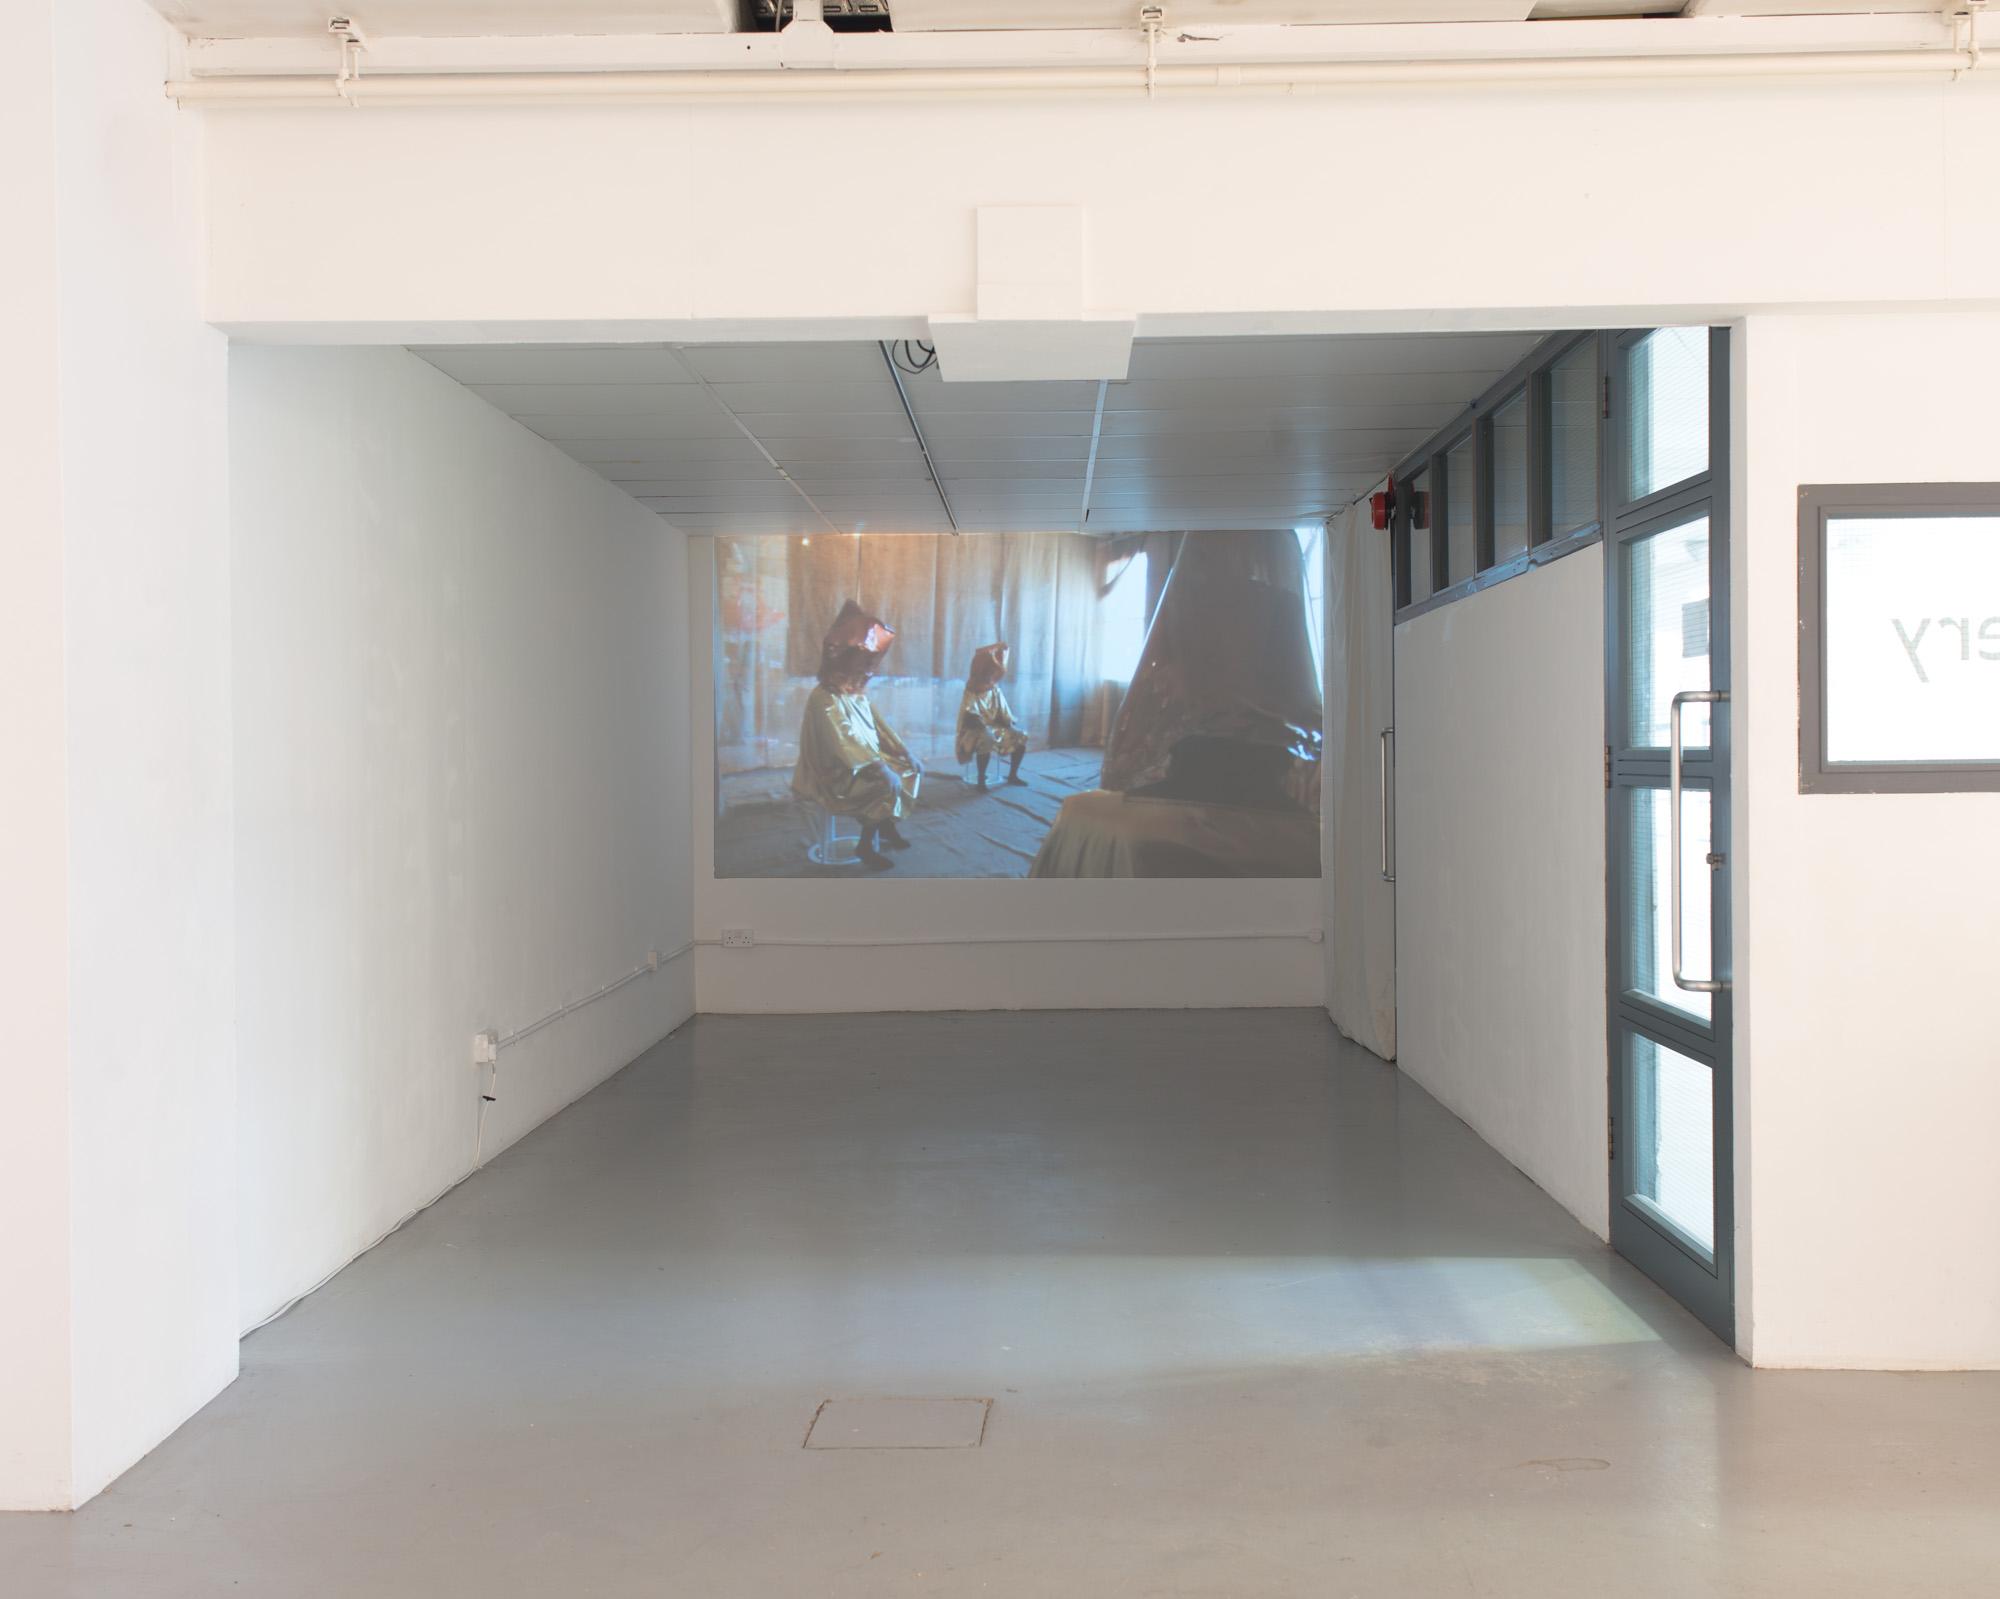 Mikala Dwyer, Goldene Bend'er, 2013, Video projection